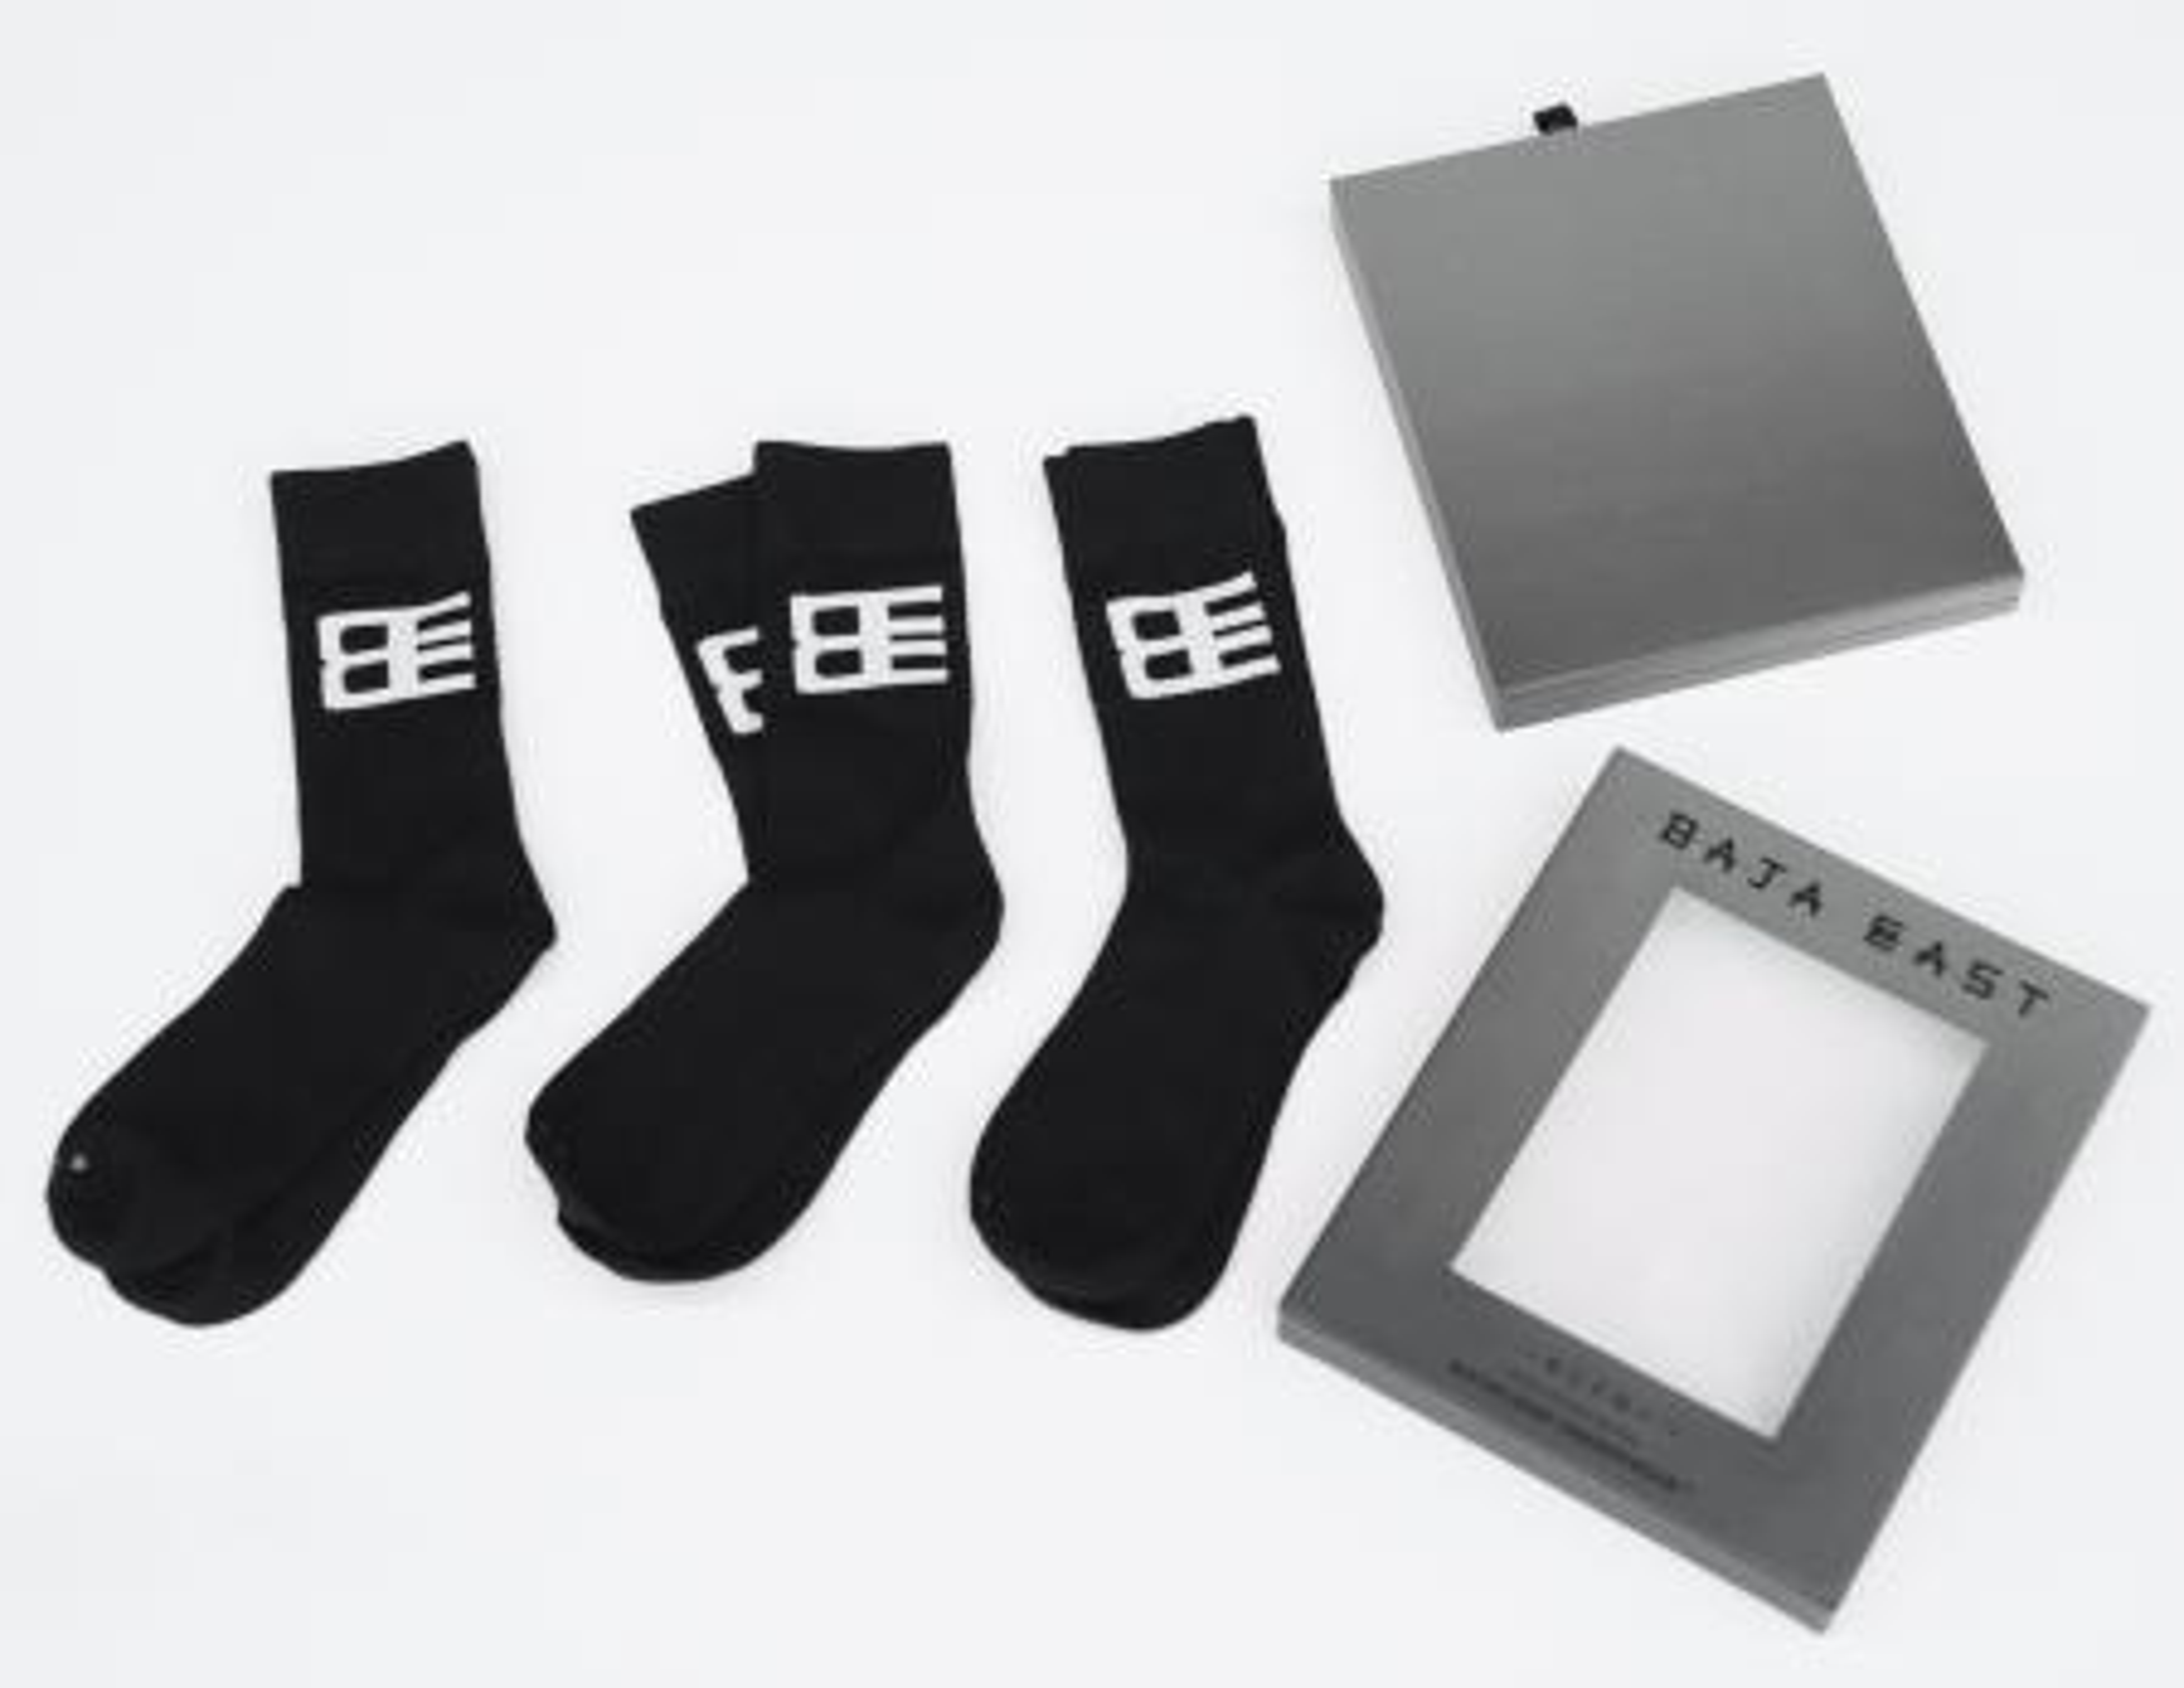 Baja East x Related unisex wool socks